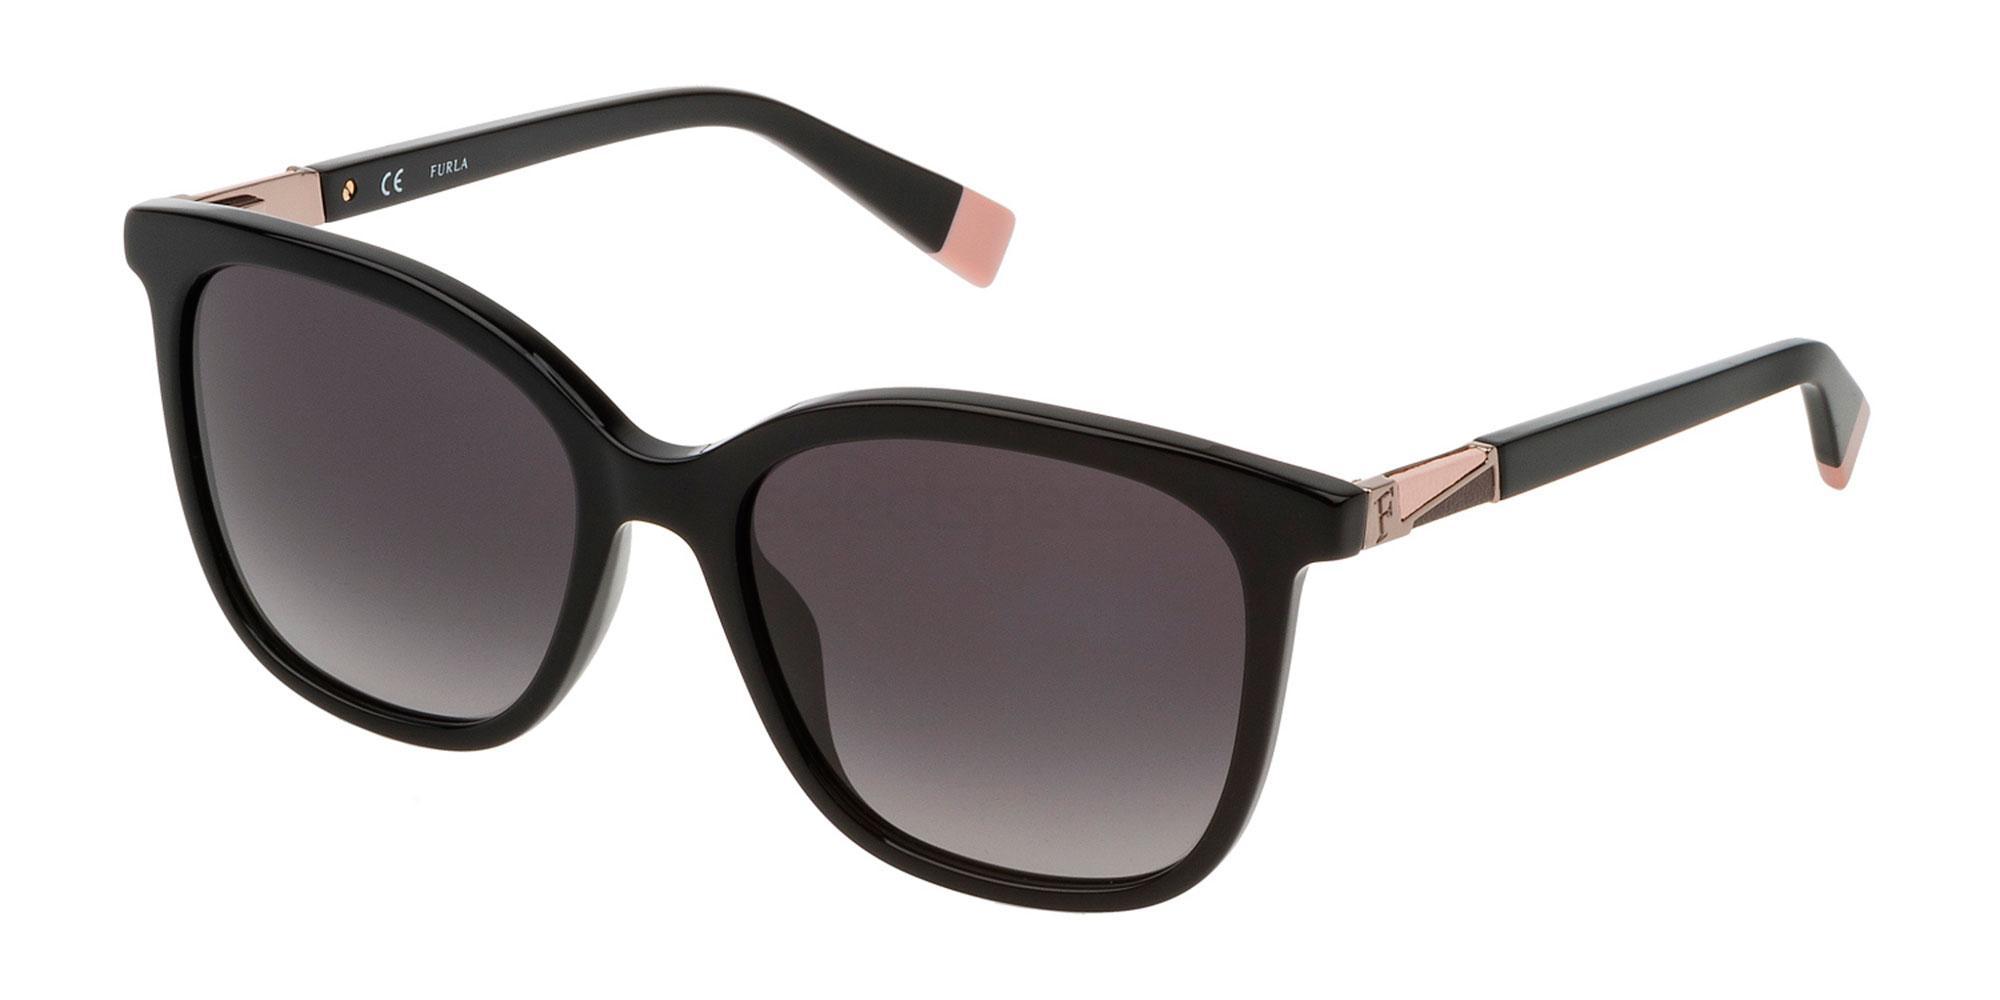 0700 SFU247 Sunglasses, Furla